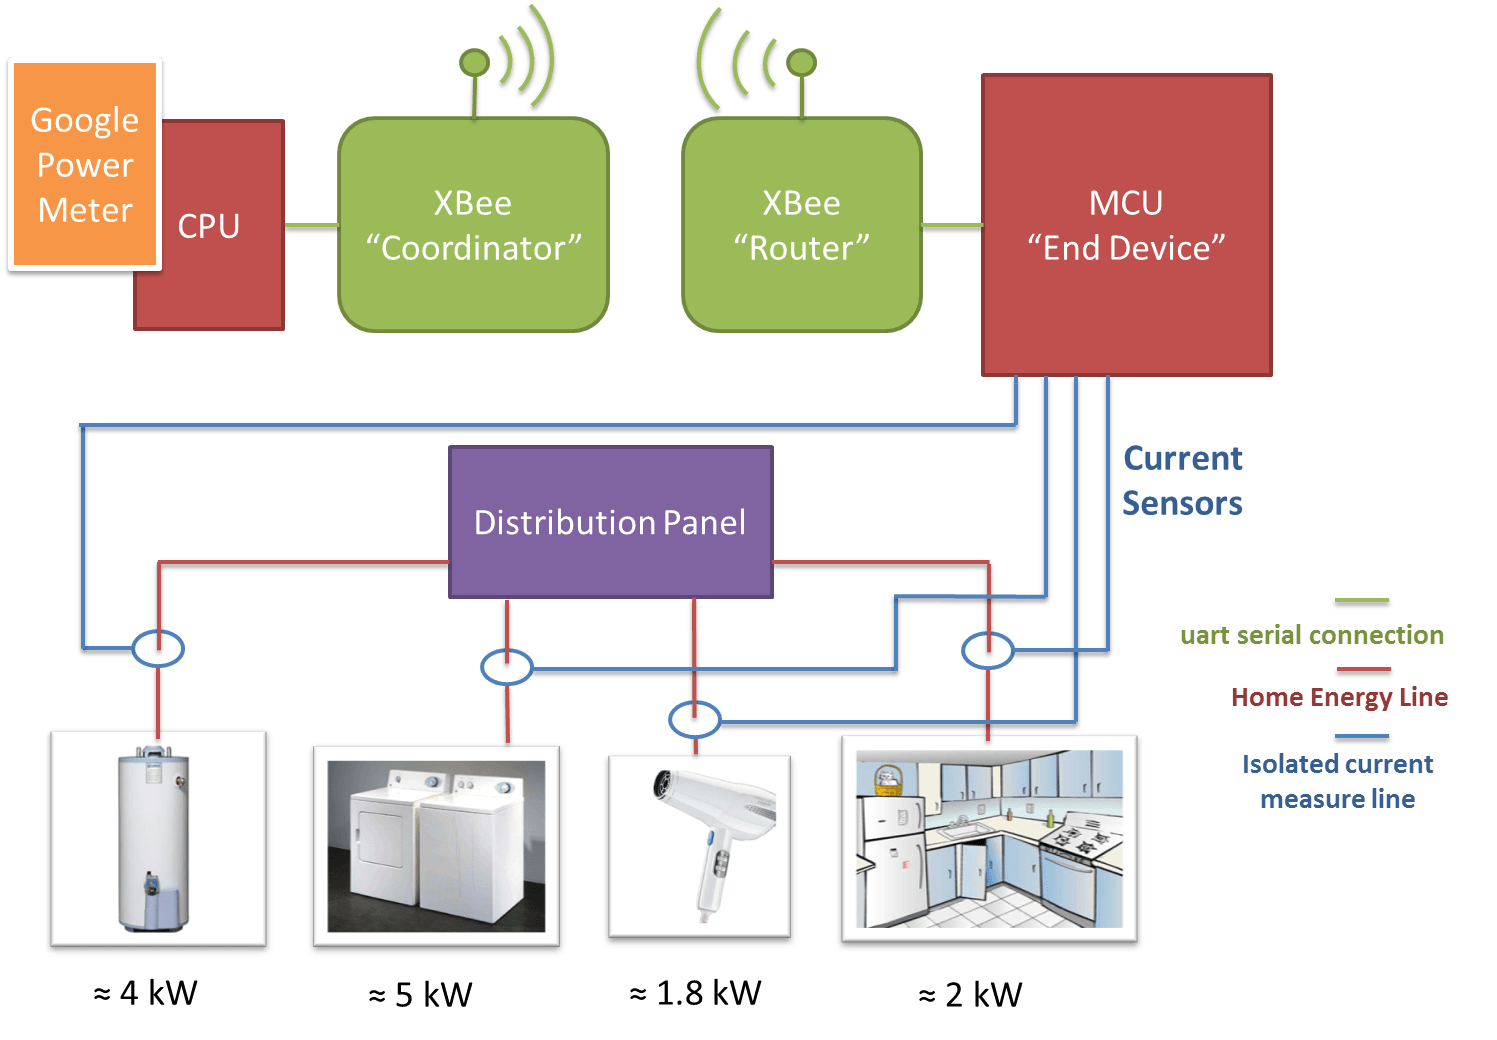 electricity meter wiring diagram clark forklift c500 xbee rf smart energy compliant power